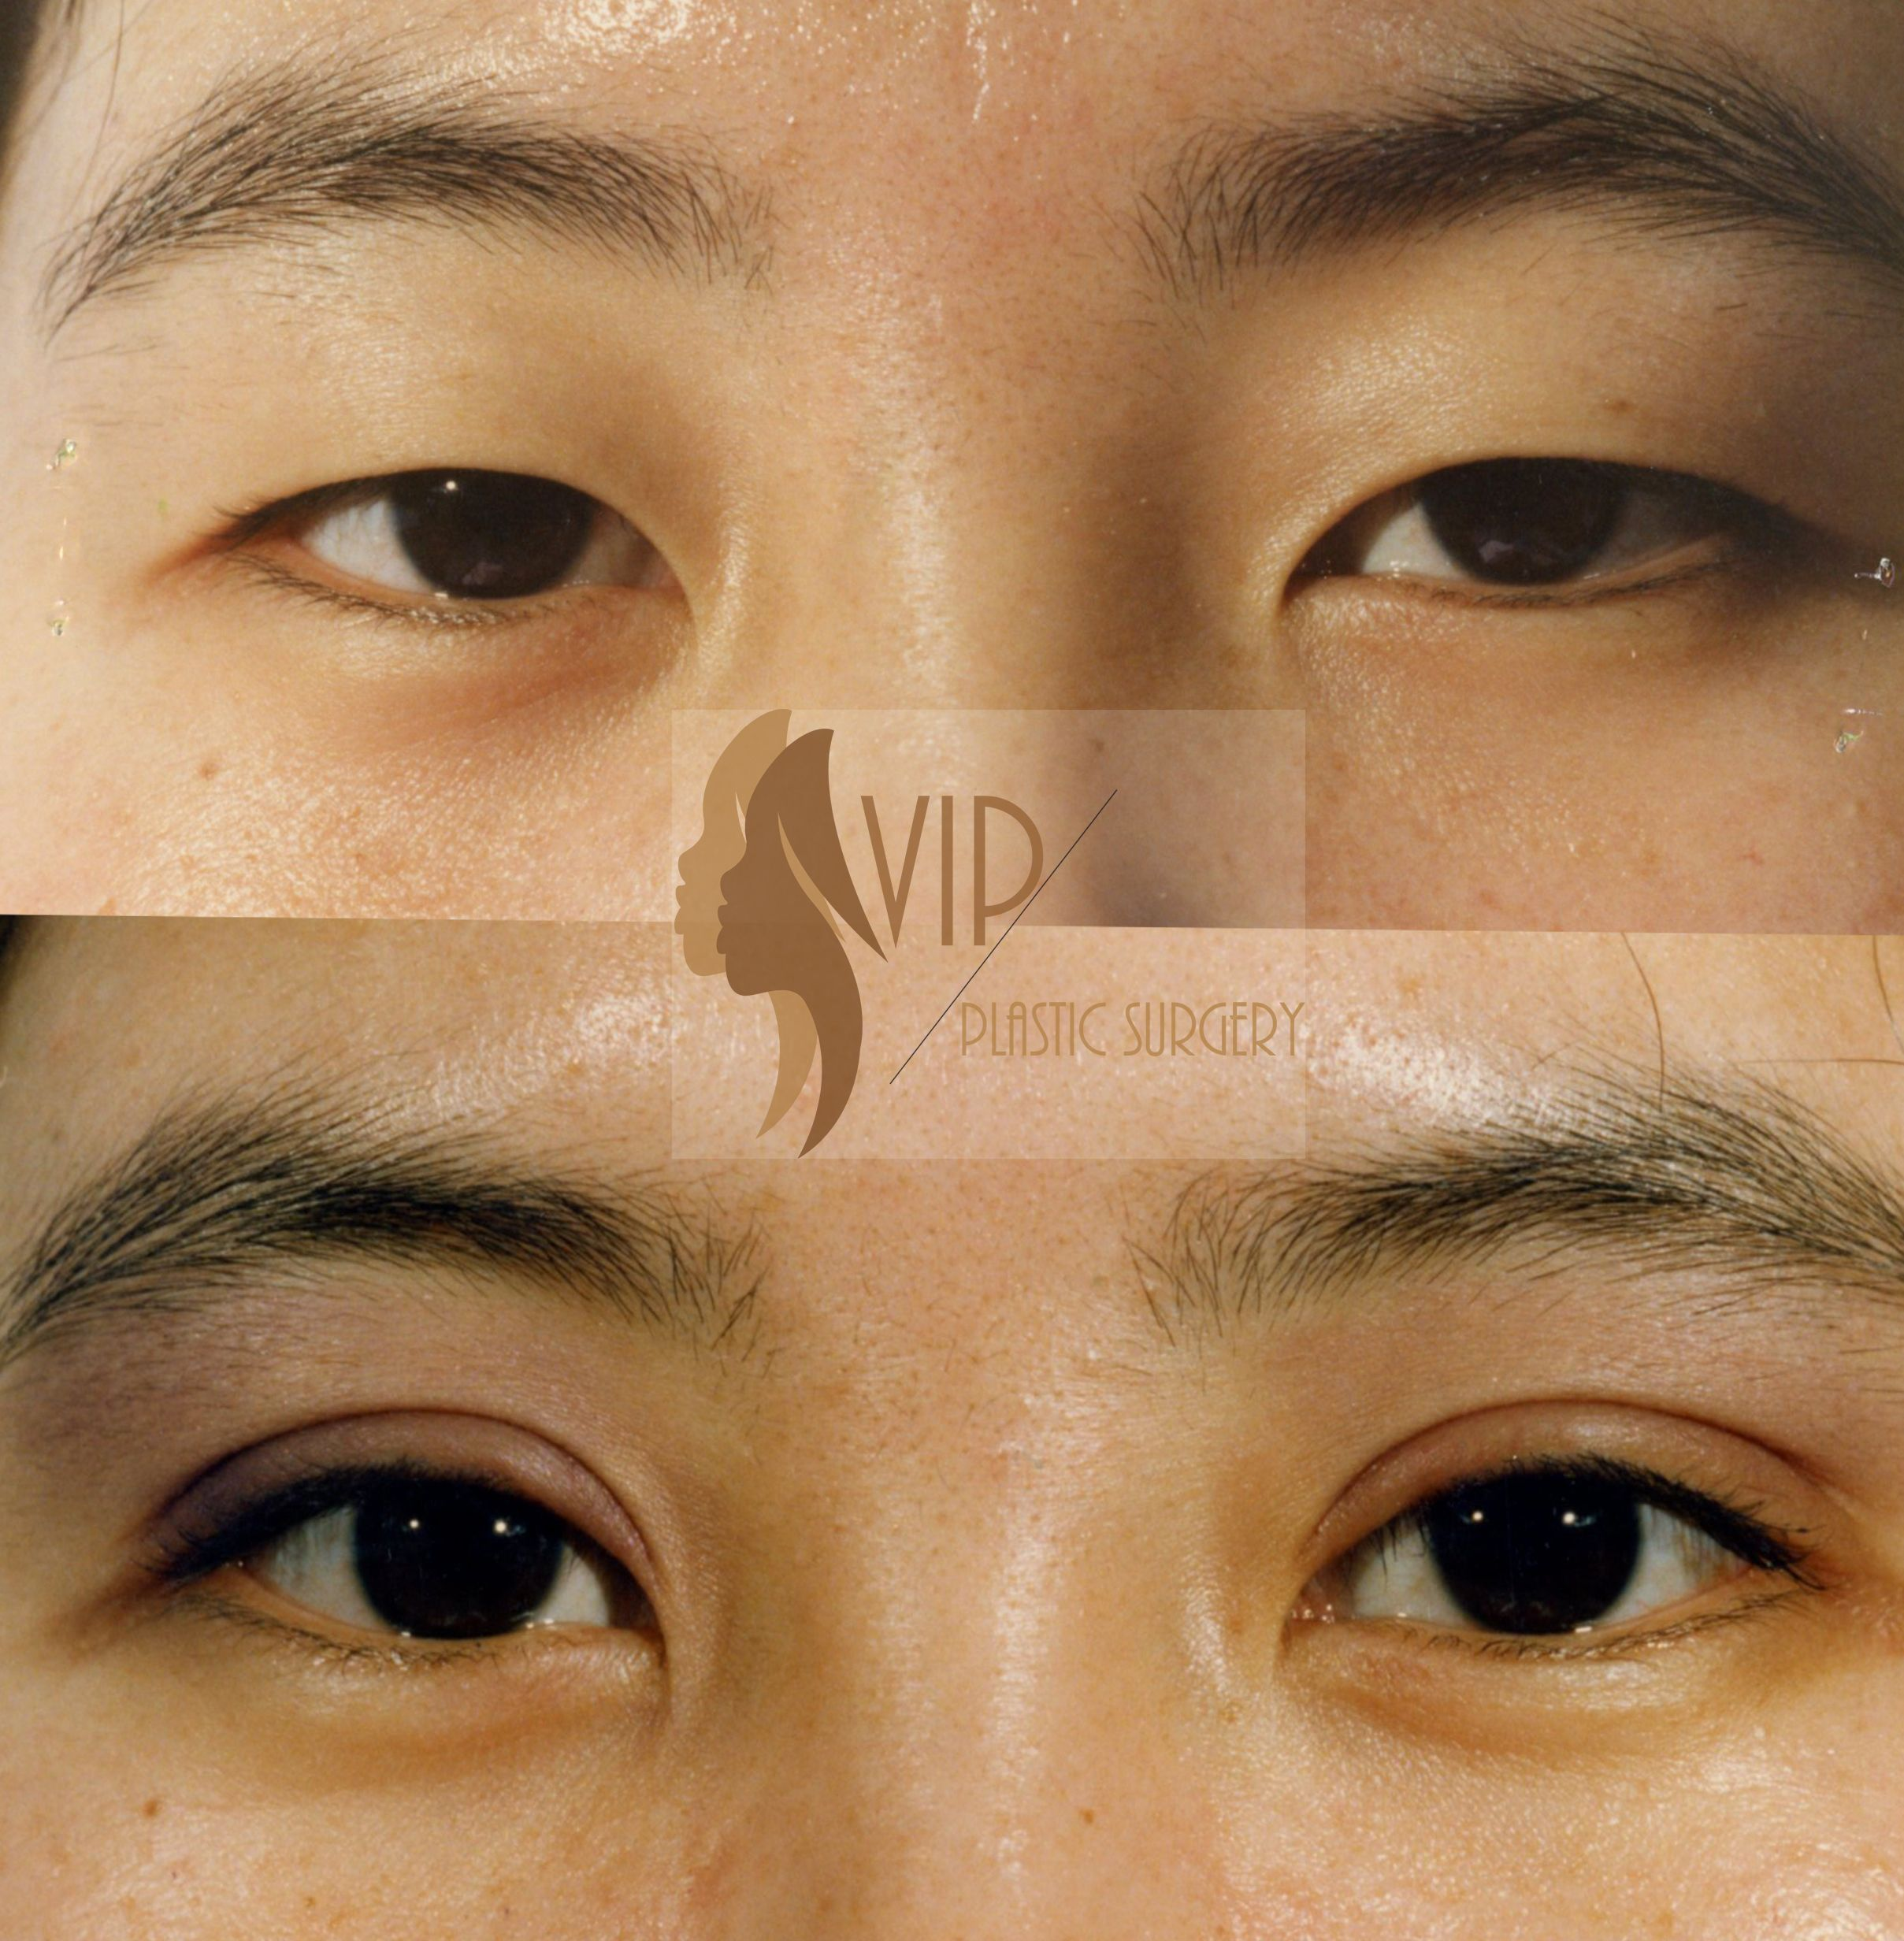 Natural incisional Upper Blepharoplasty. VIP Plastic